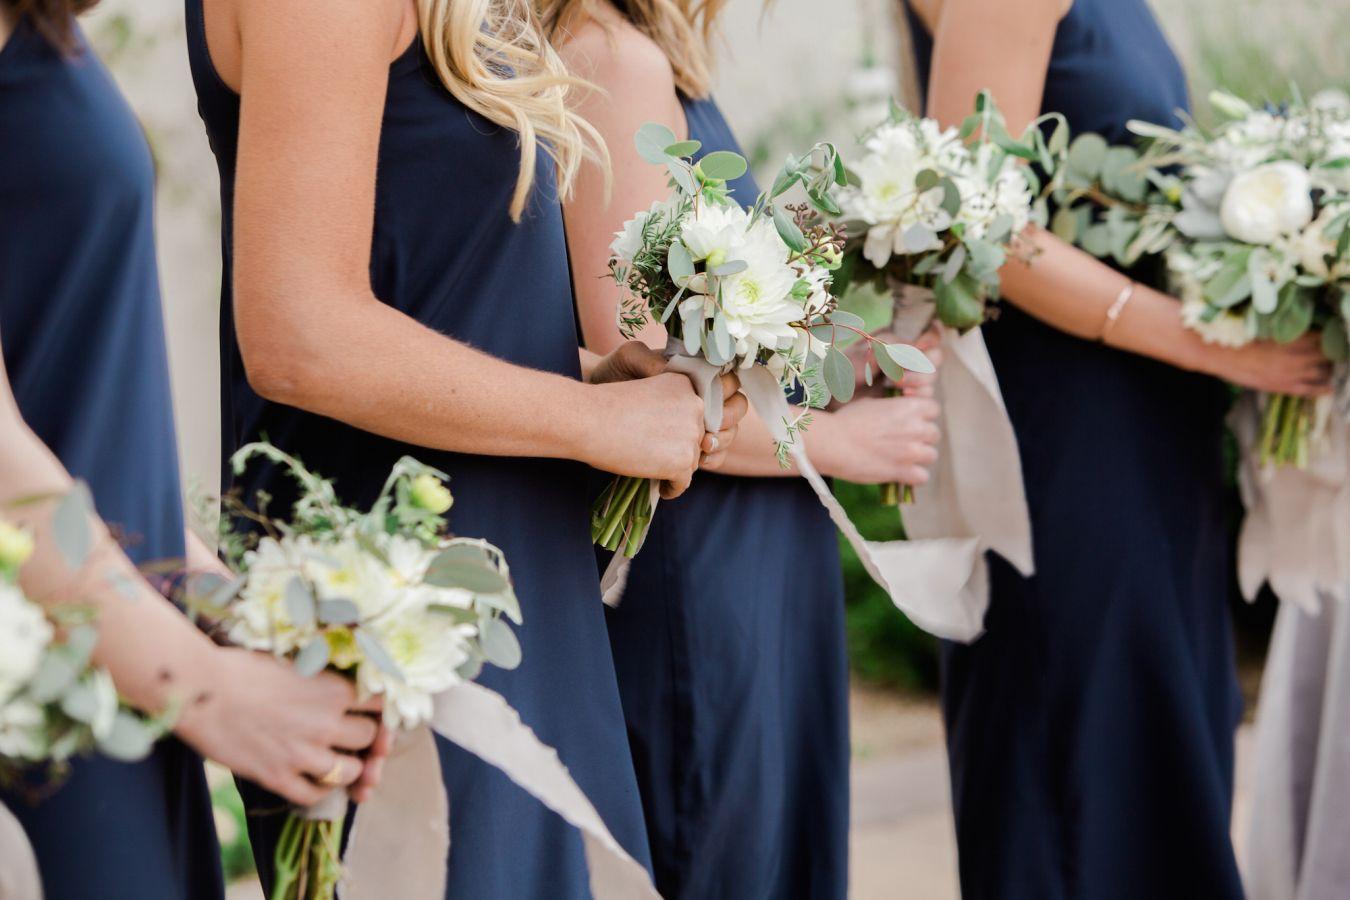 Worst-Case Wedding Scenarios—and How to Handle Them Image 2